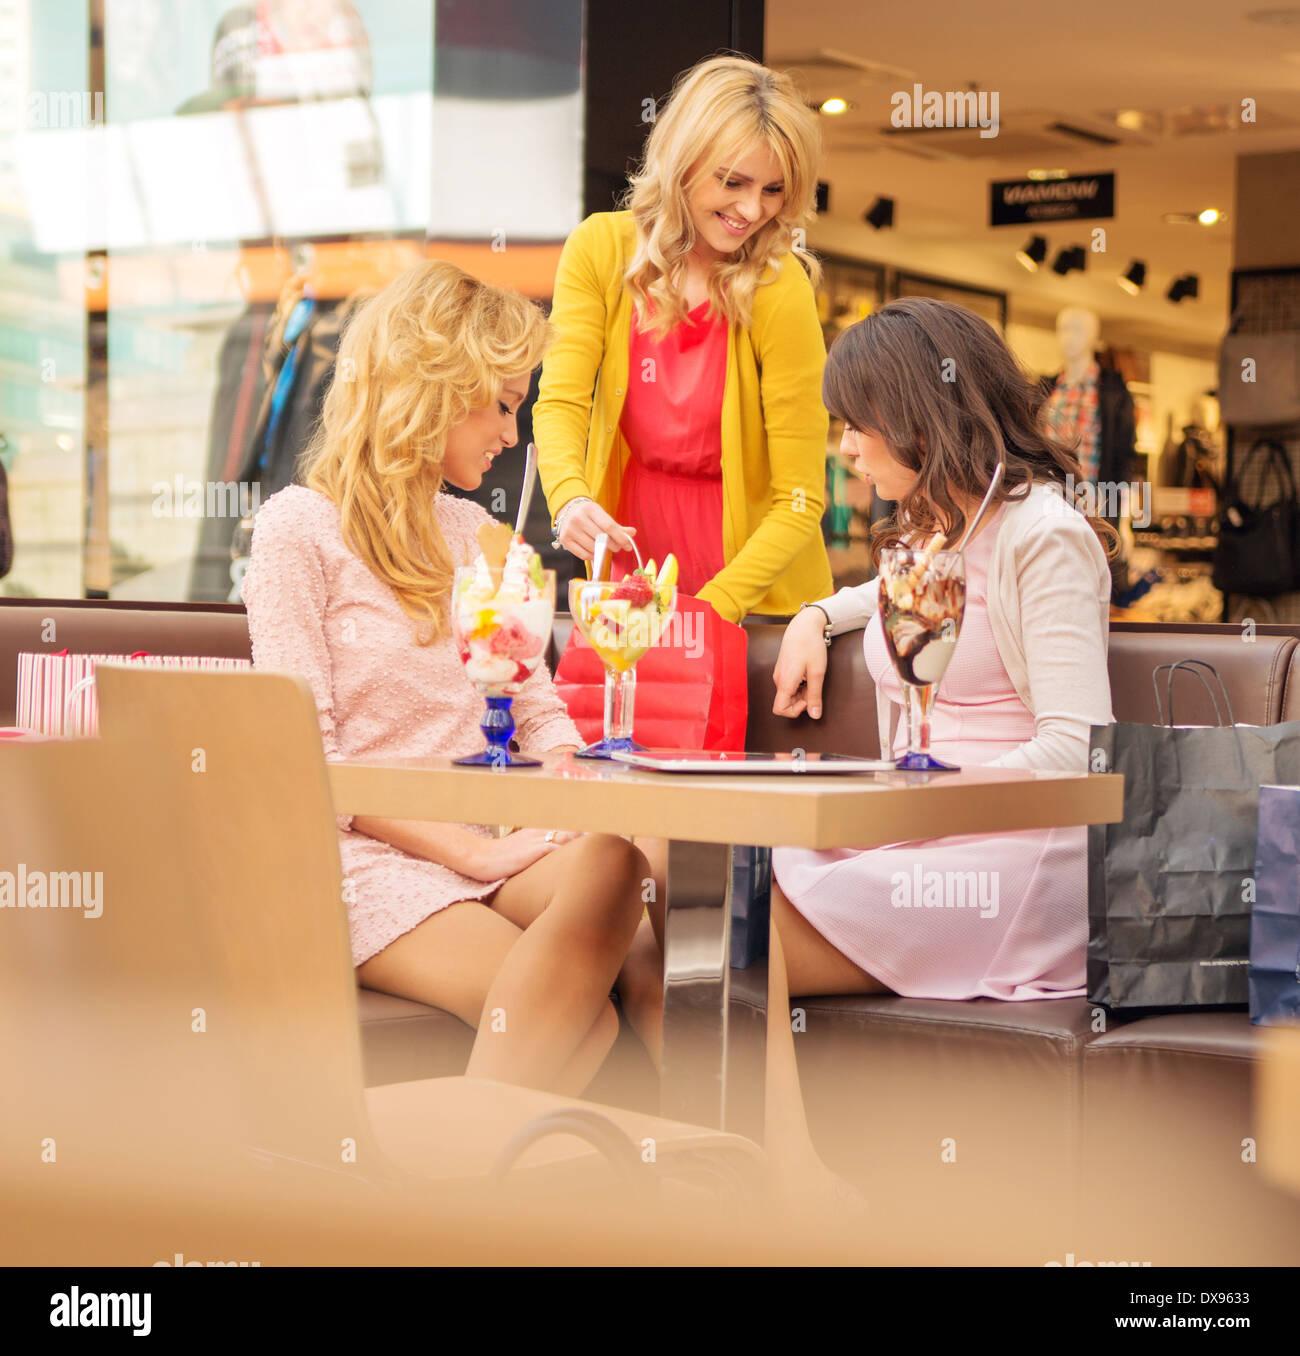 Drei junge fröhliche Freundinnen in der kurzen Pause Stockbild